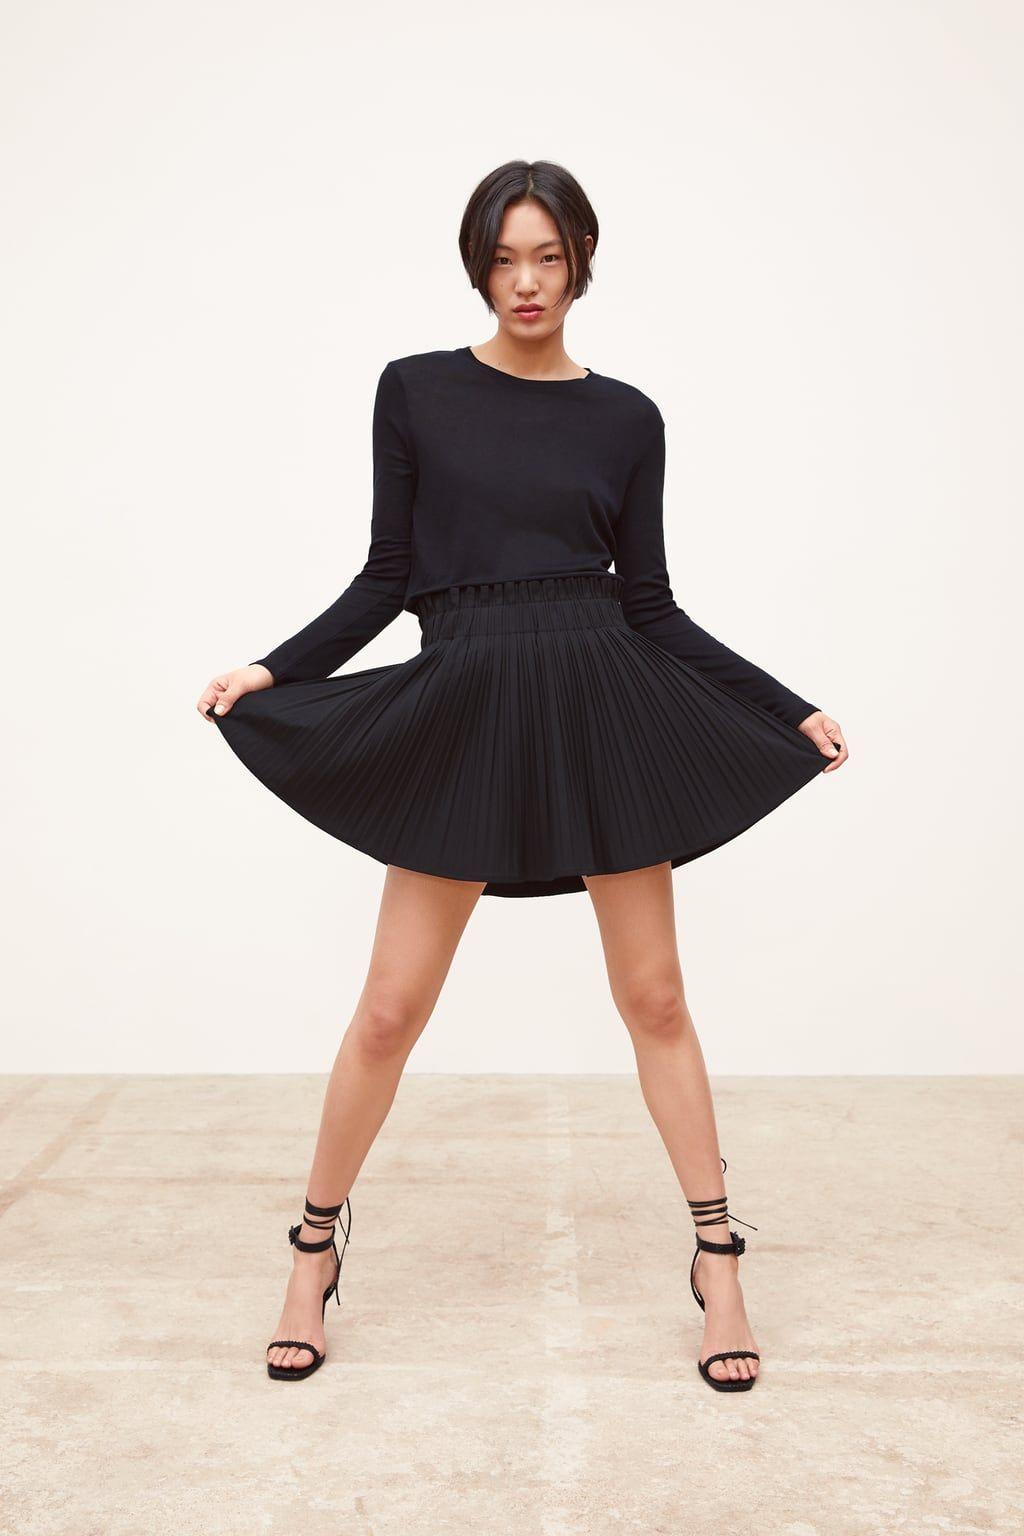 New Women Winter Miniskirt Stretchy Waist Pleated Skirt Faux Leather Short Dress